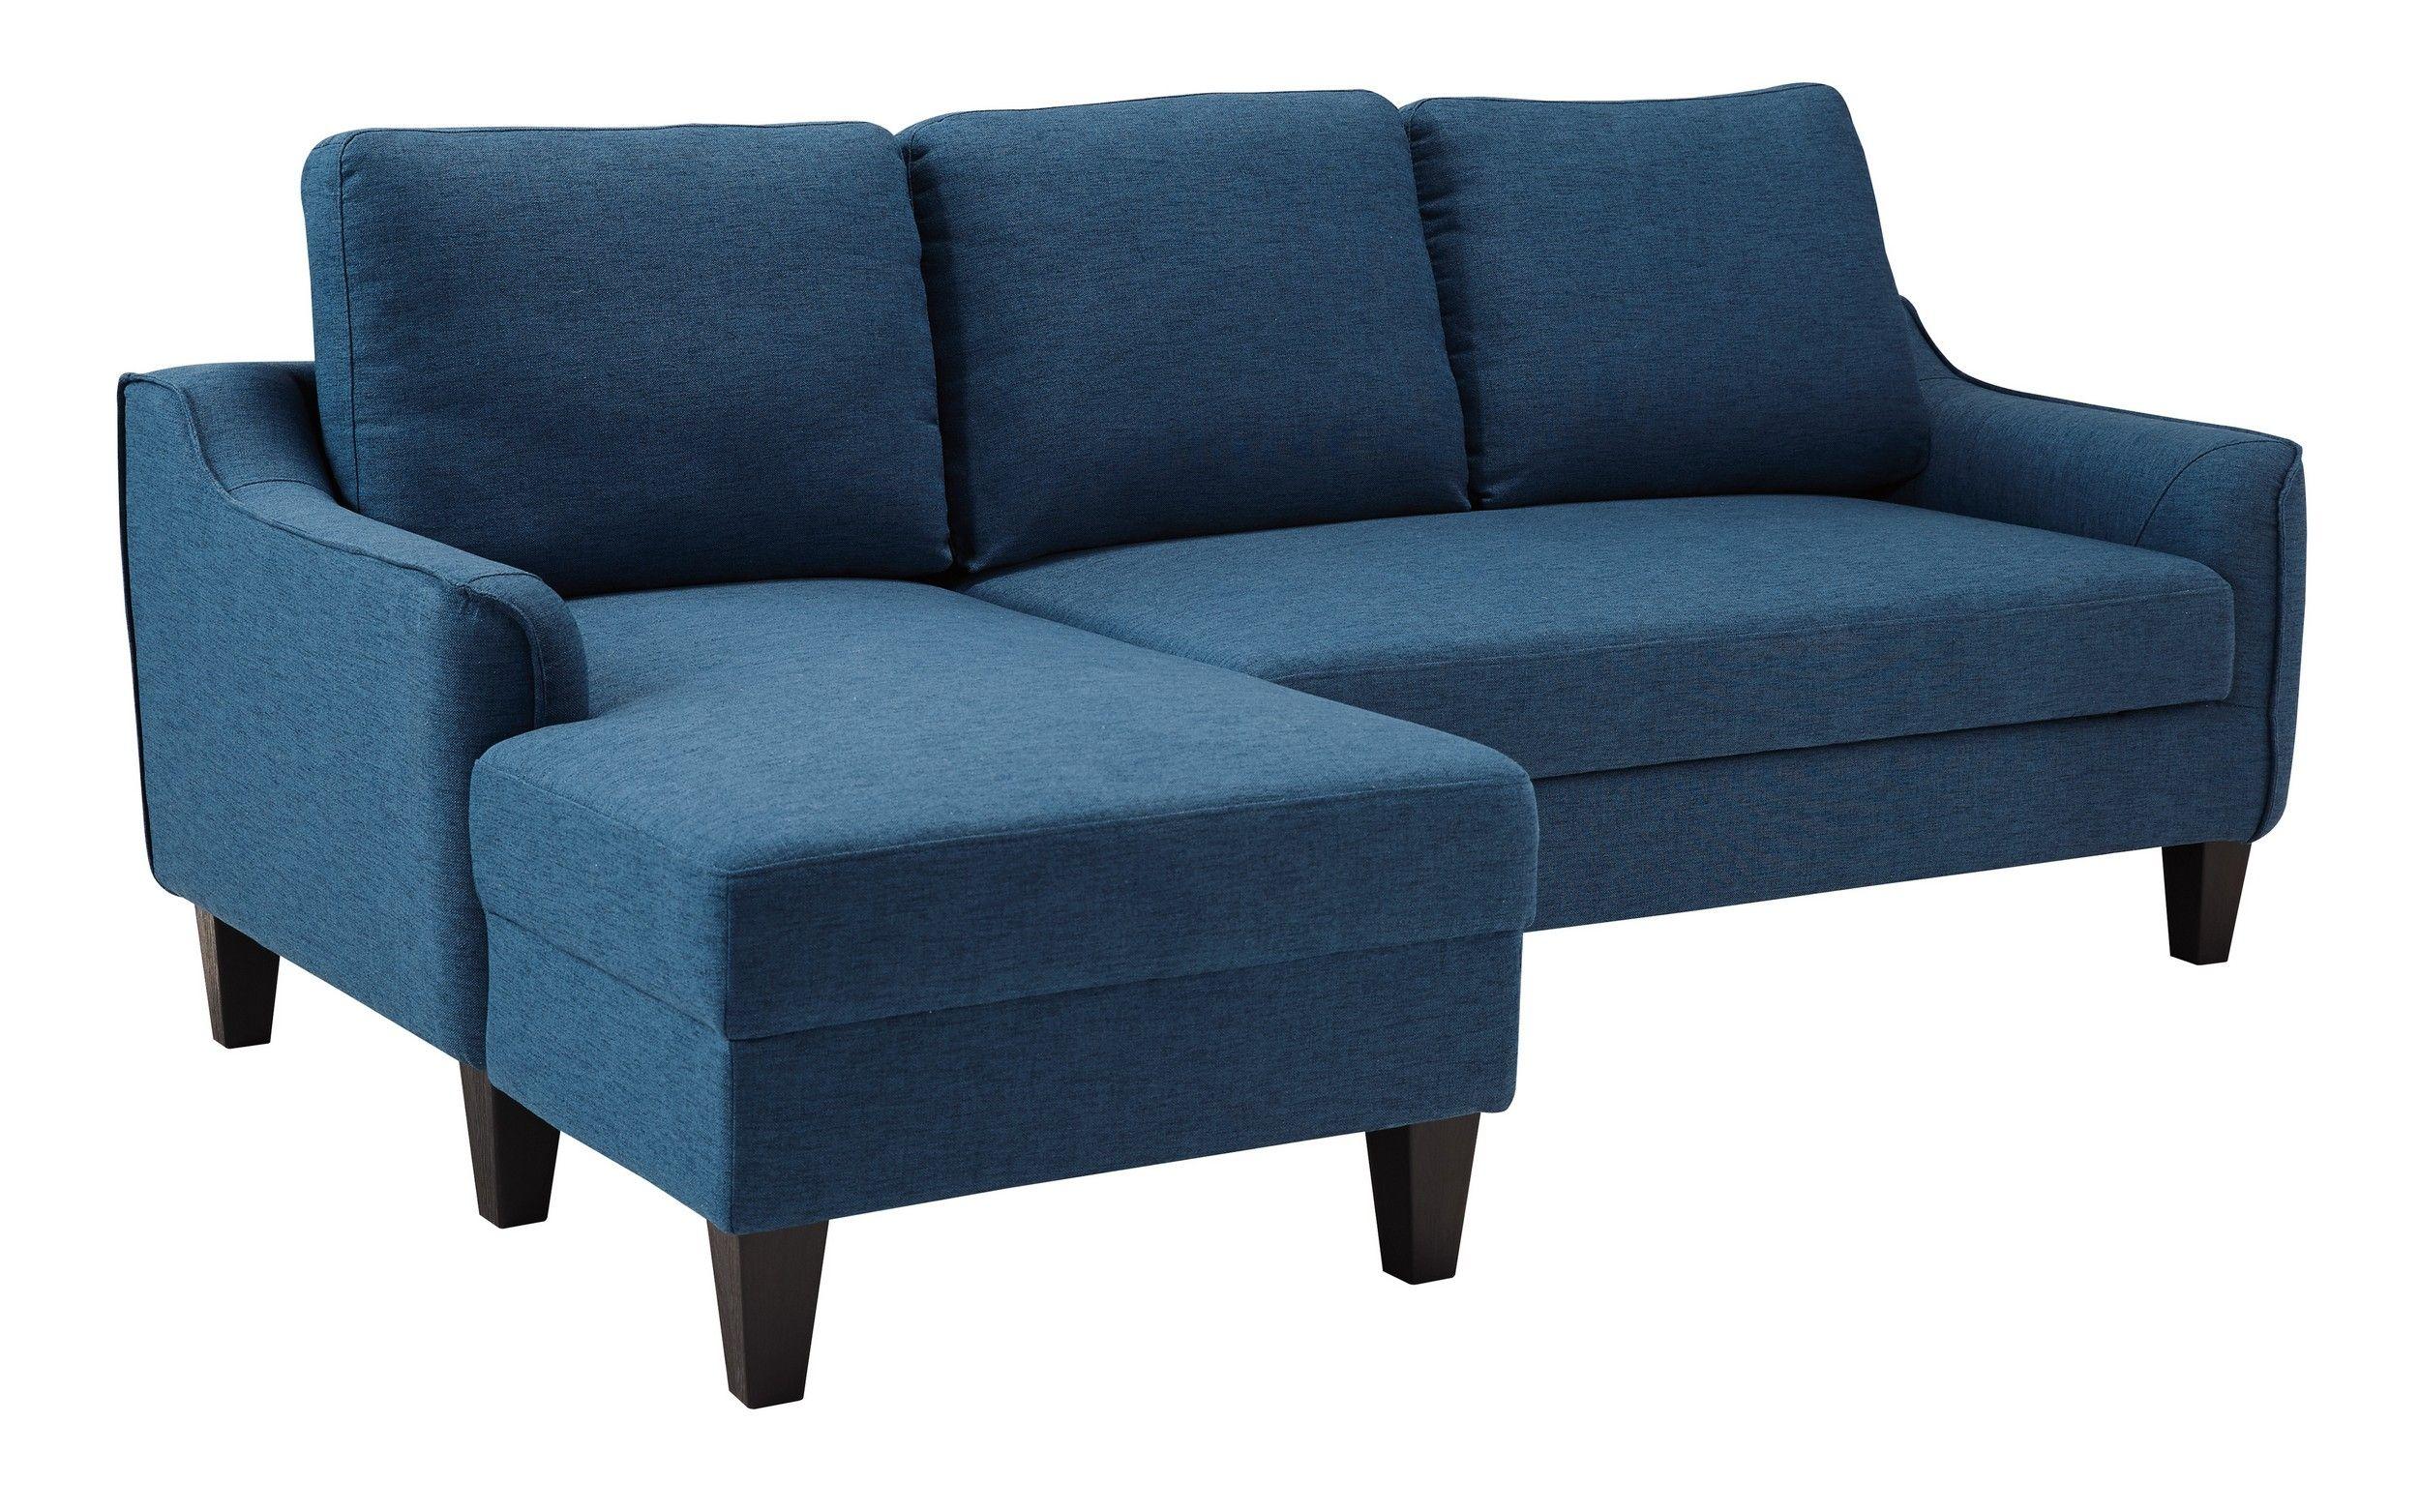 Signature Design By Ashley Jarreau Blue Sleeper Sofa Chaise